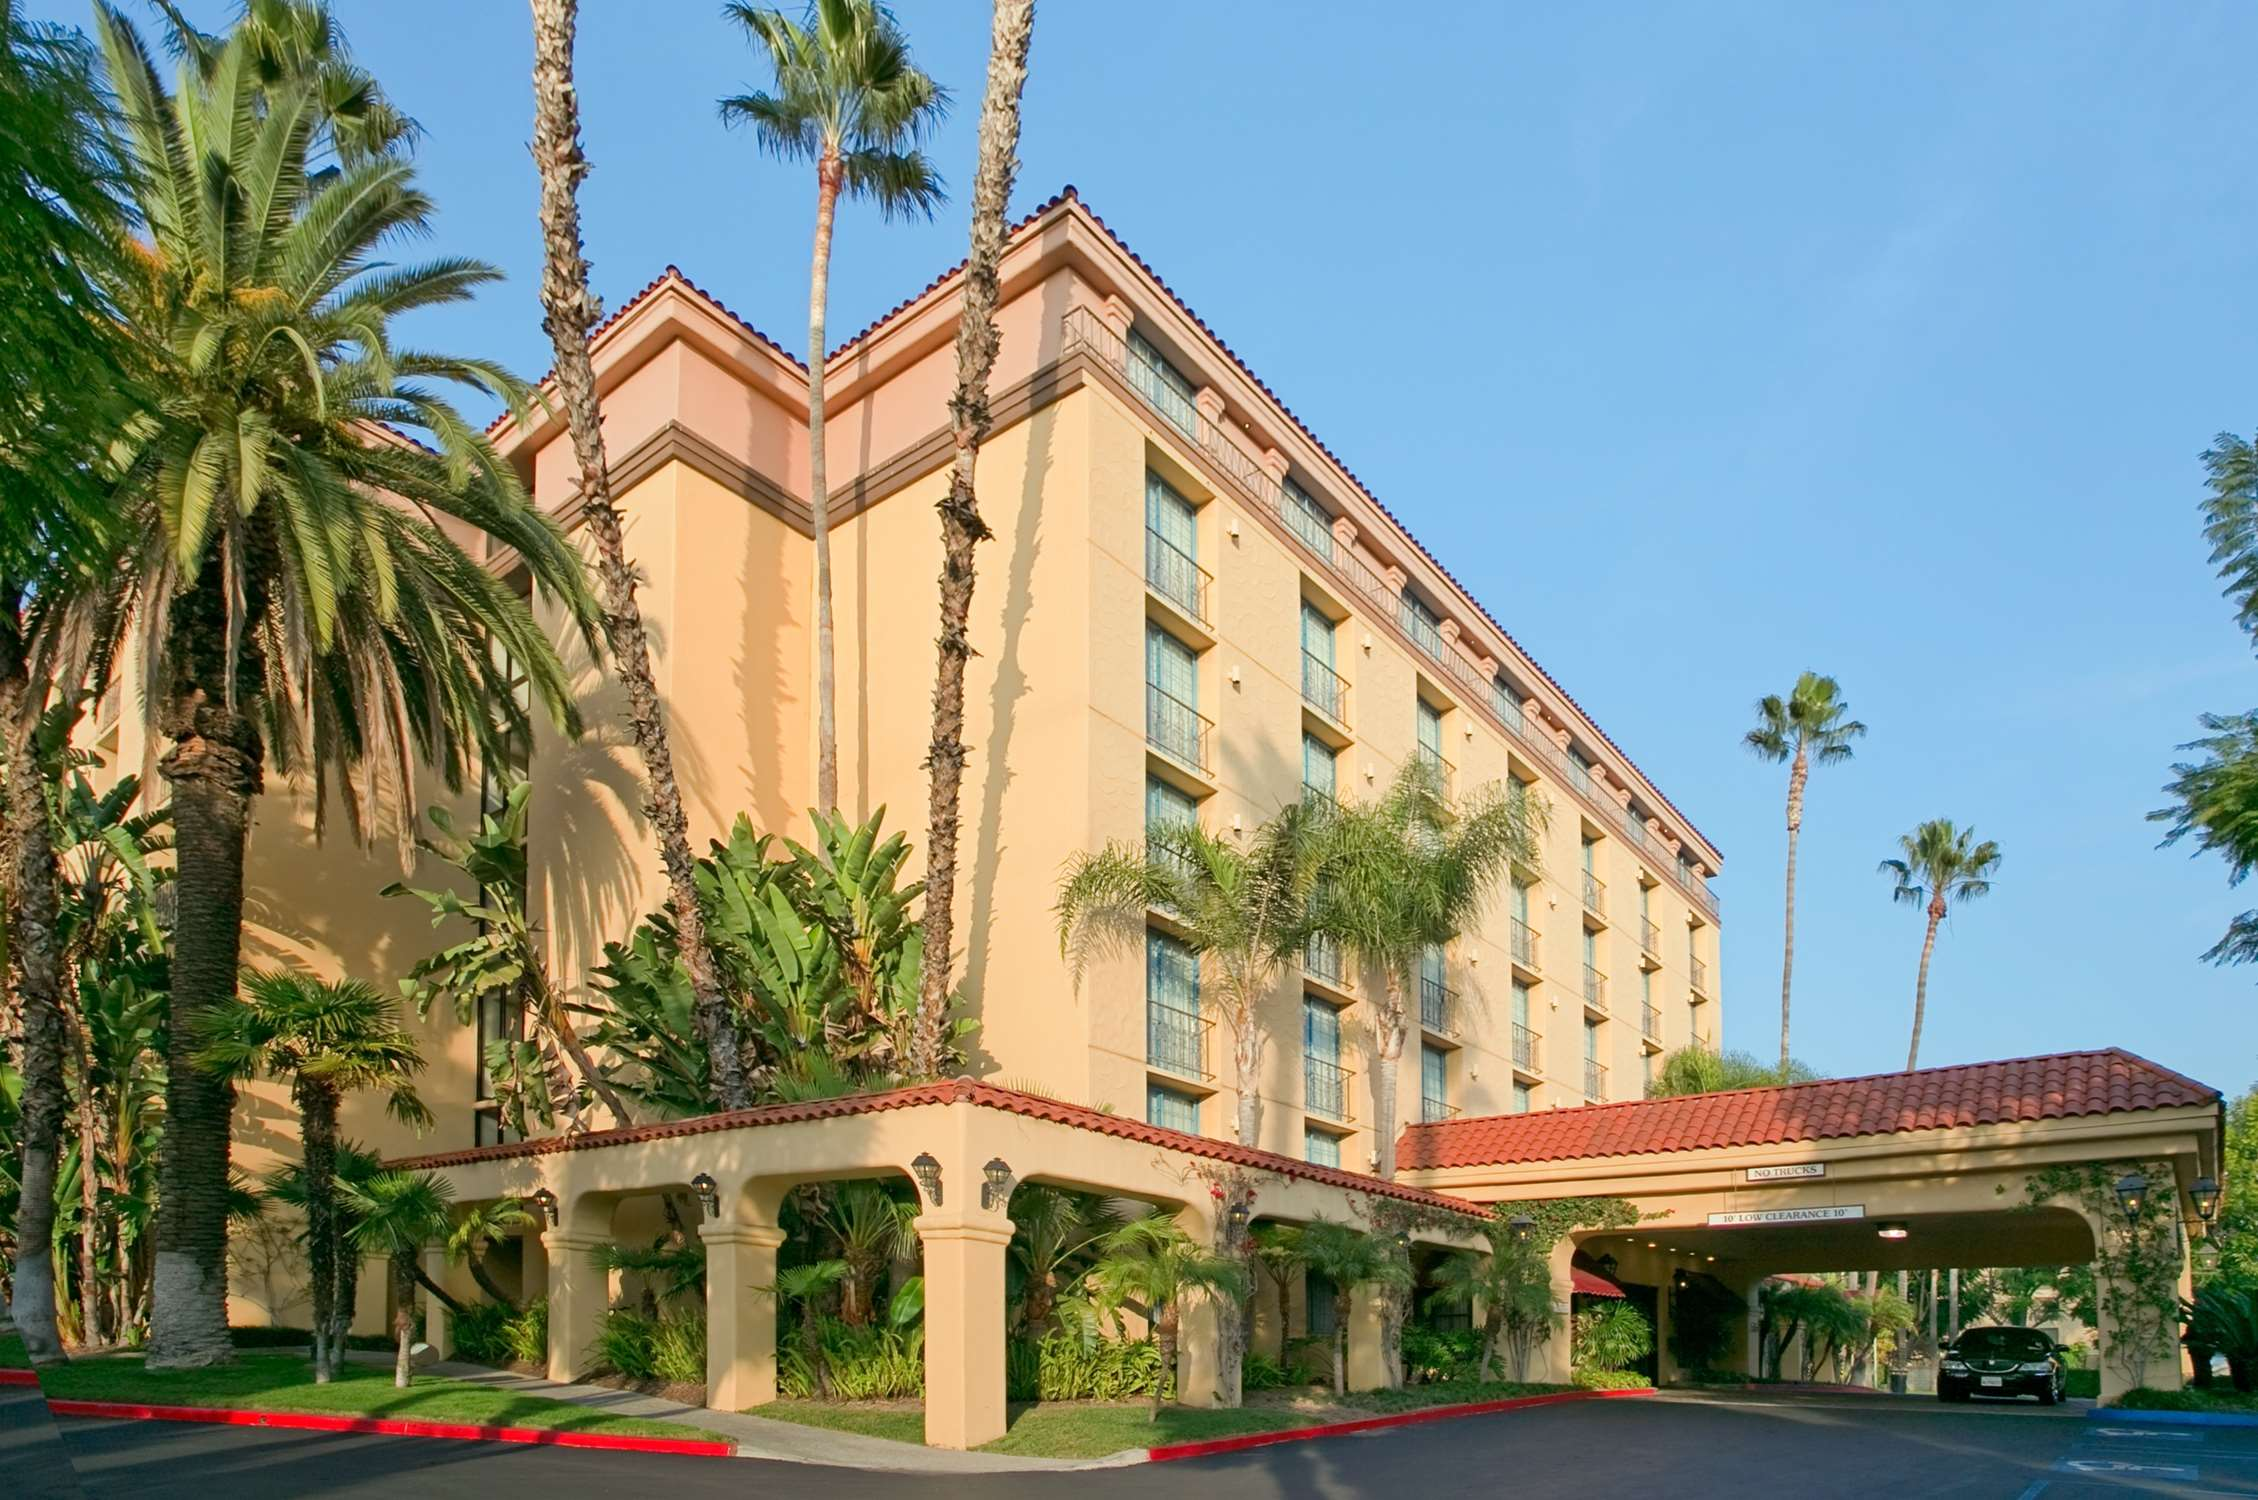 Embassy Suites by Hilton Arcadia Pasadena Area image 2